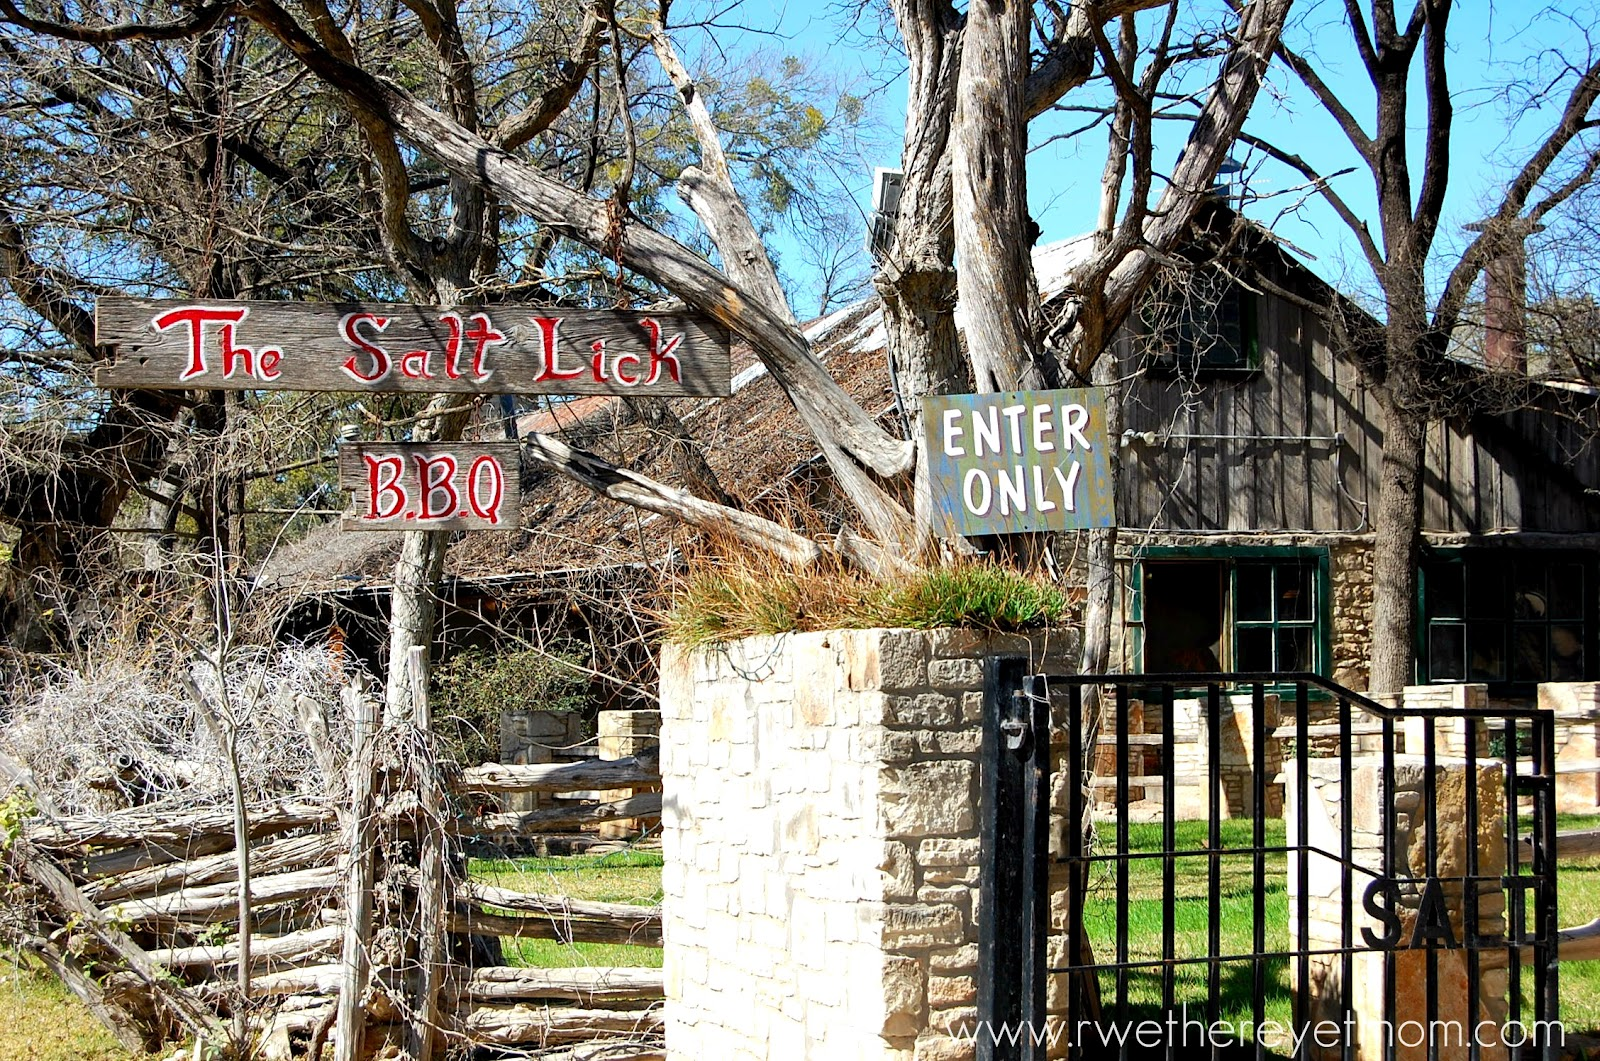 Salt lick bbq driftwood texas valuable phrase